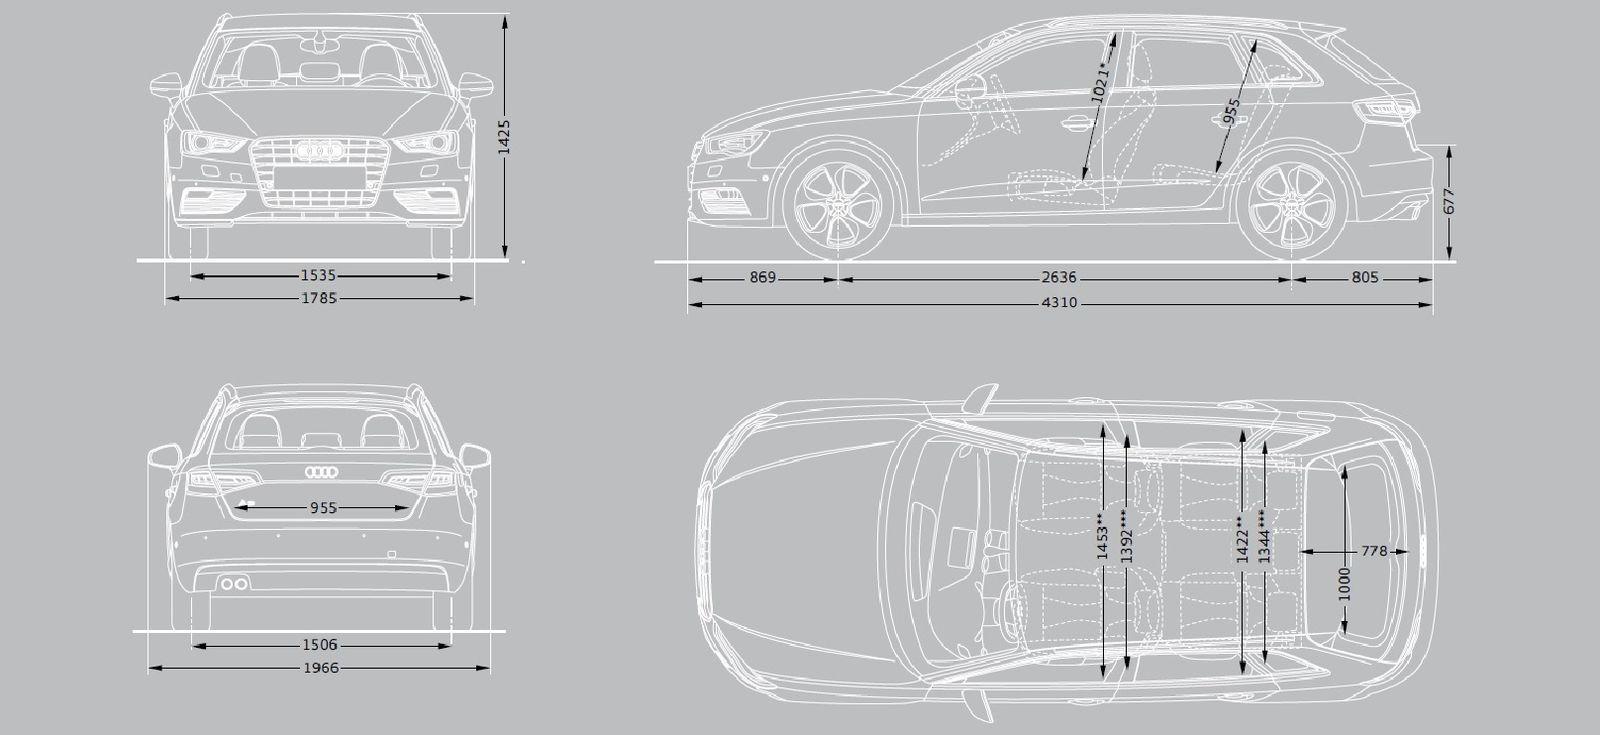 Kia Seat Belt Parts on Tesla Model 3 Dimensions